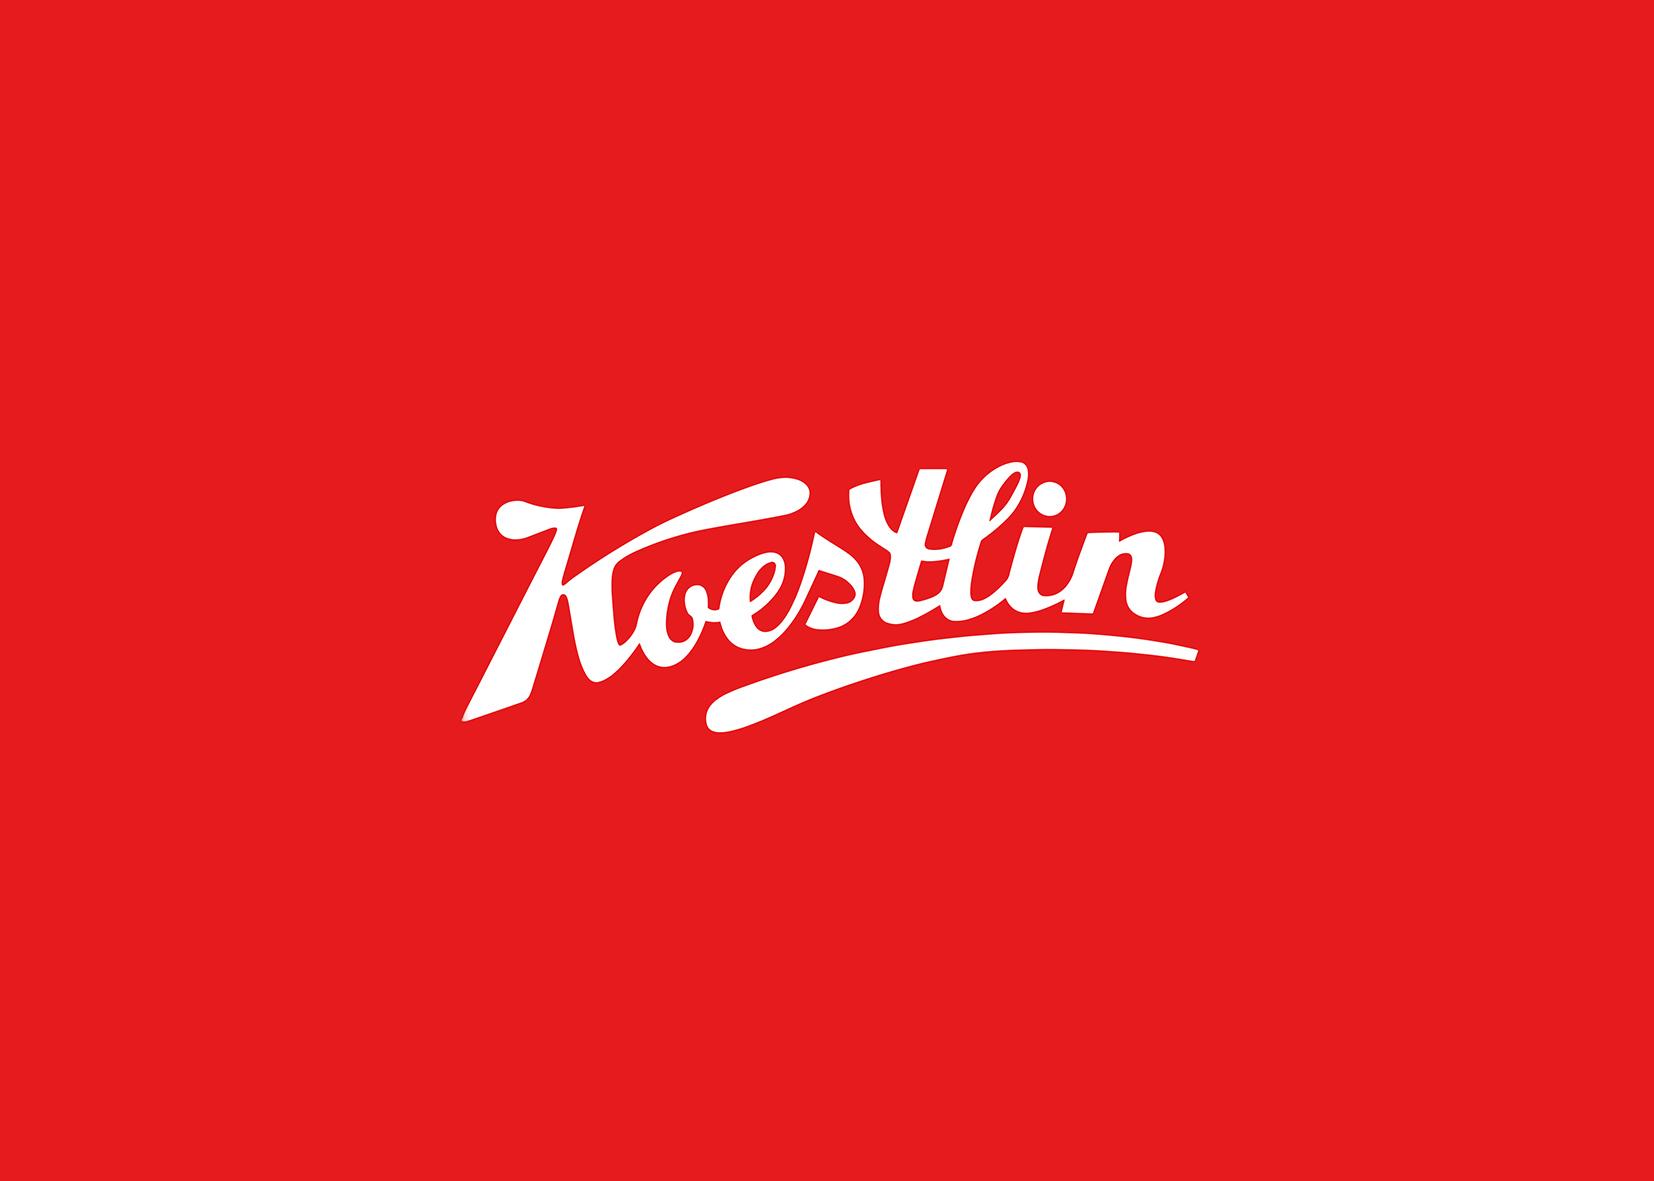 KOESTLIN, Croatia